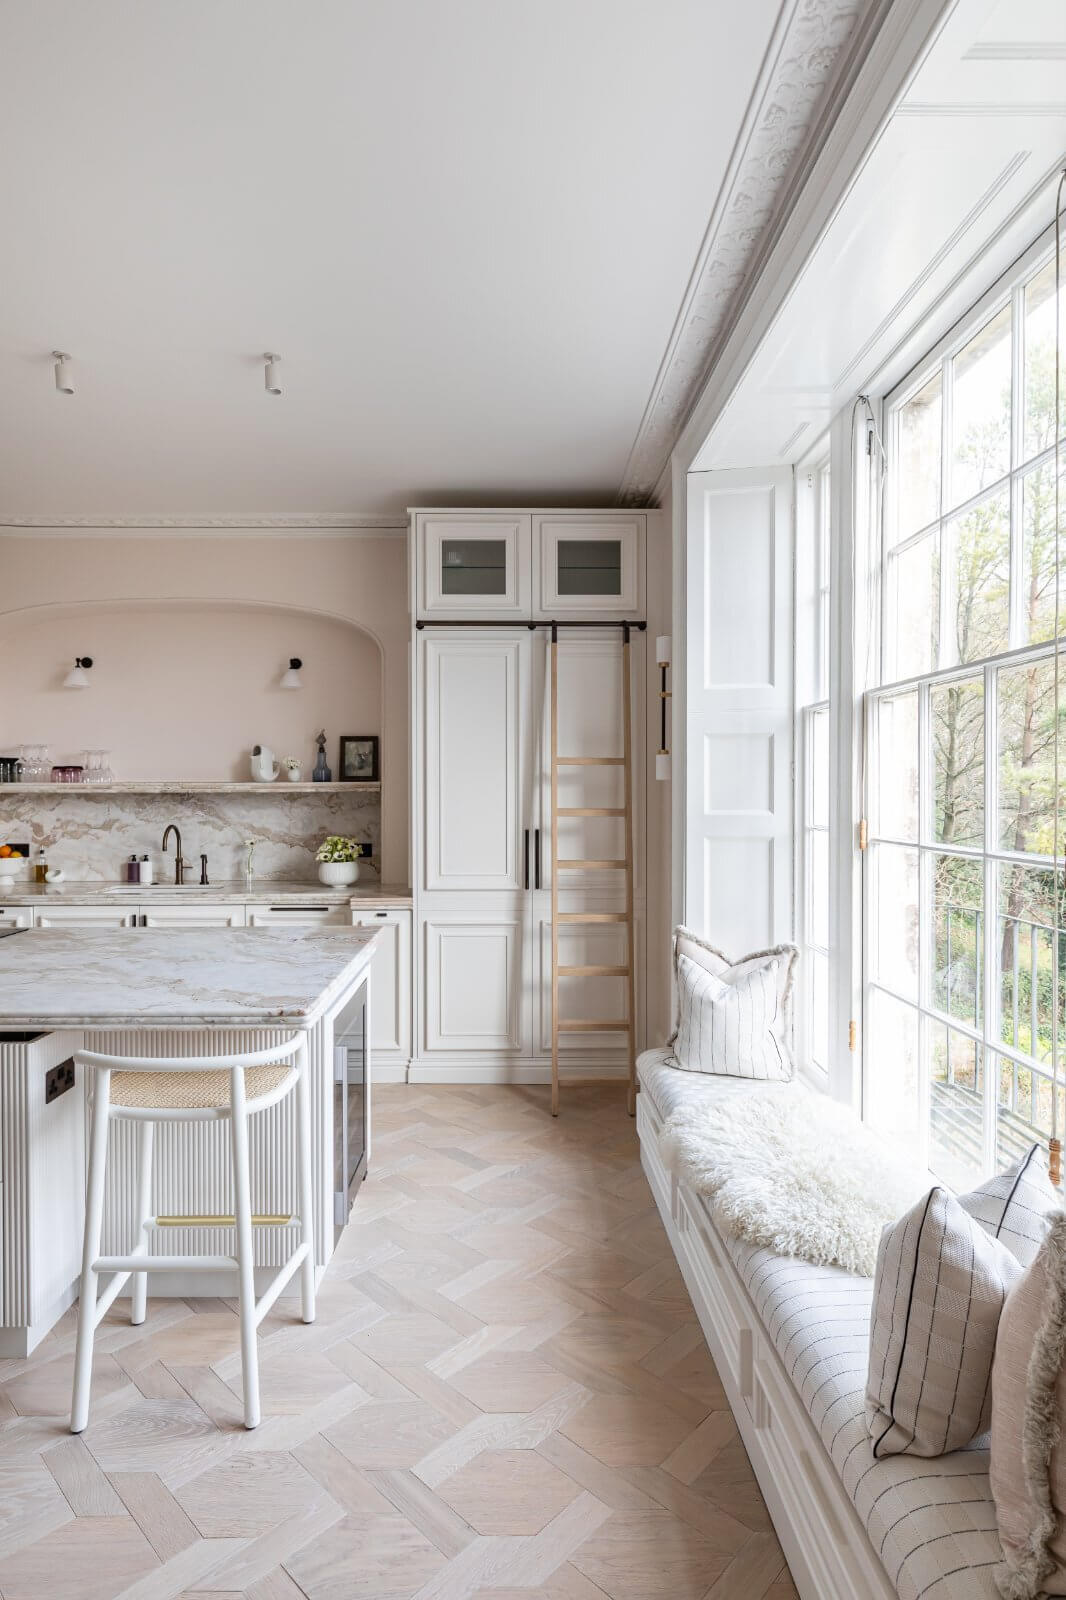 serene-townhouse-bath-kitchen-gainsborough-nordroom